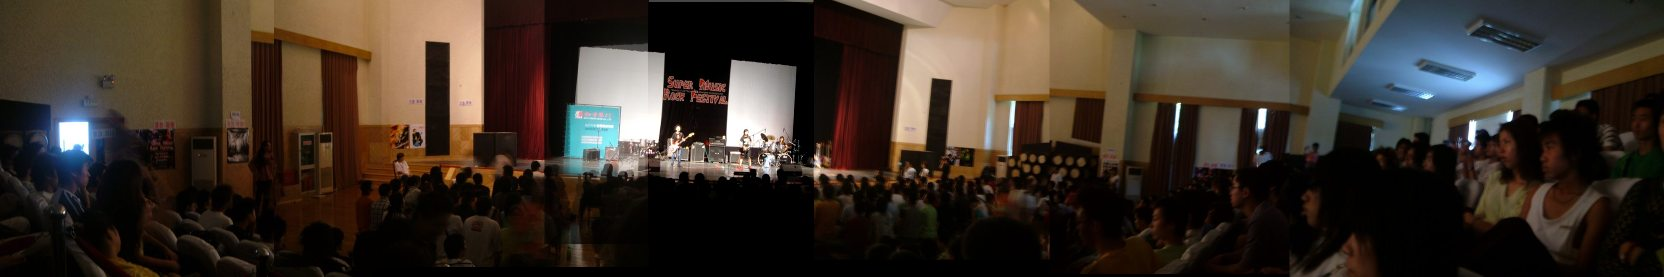 The venue was huge.